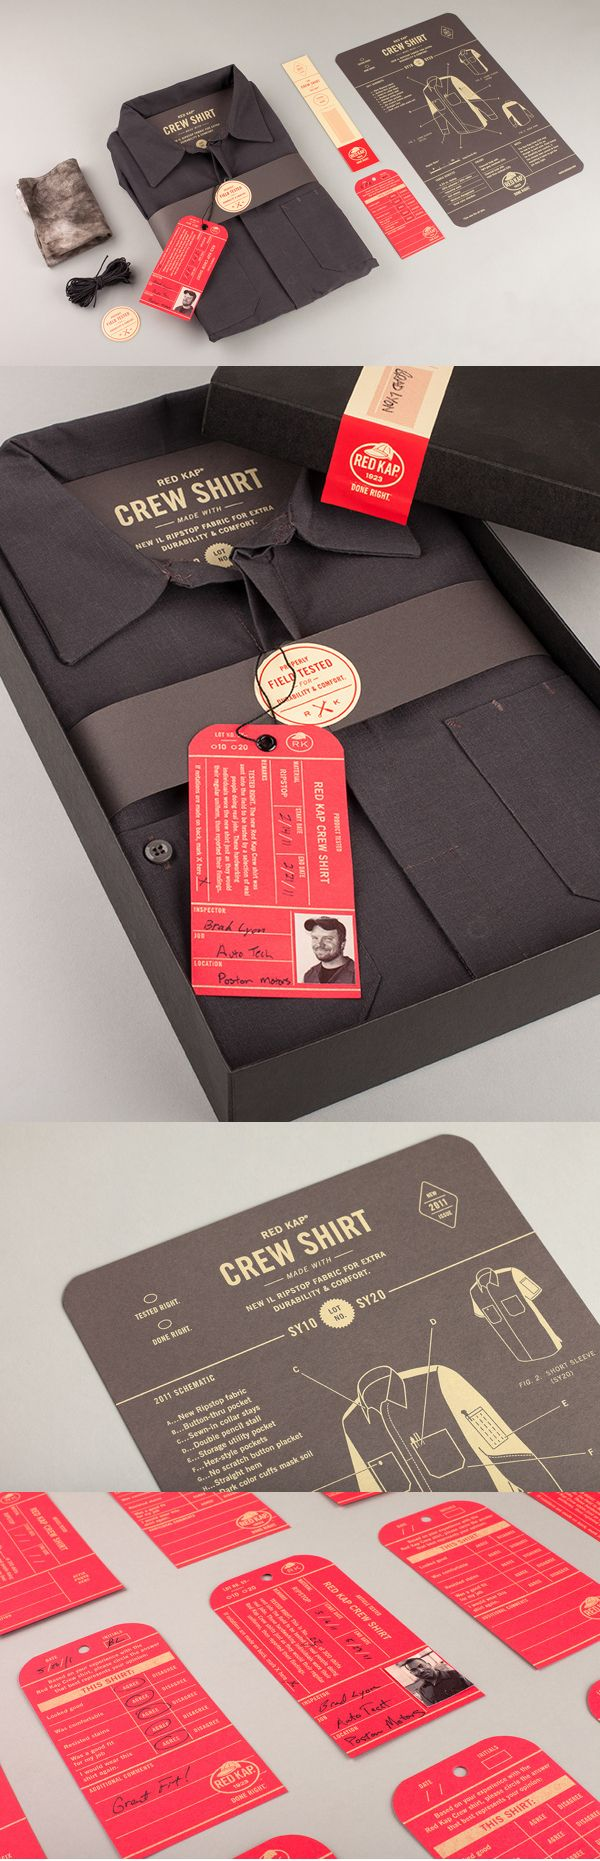 Red Kap #identity #packaging #branding PD